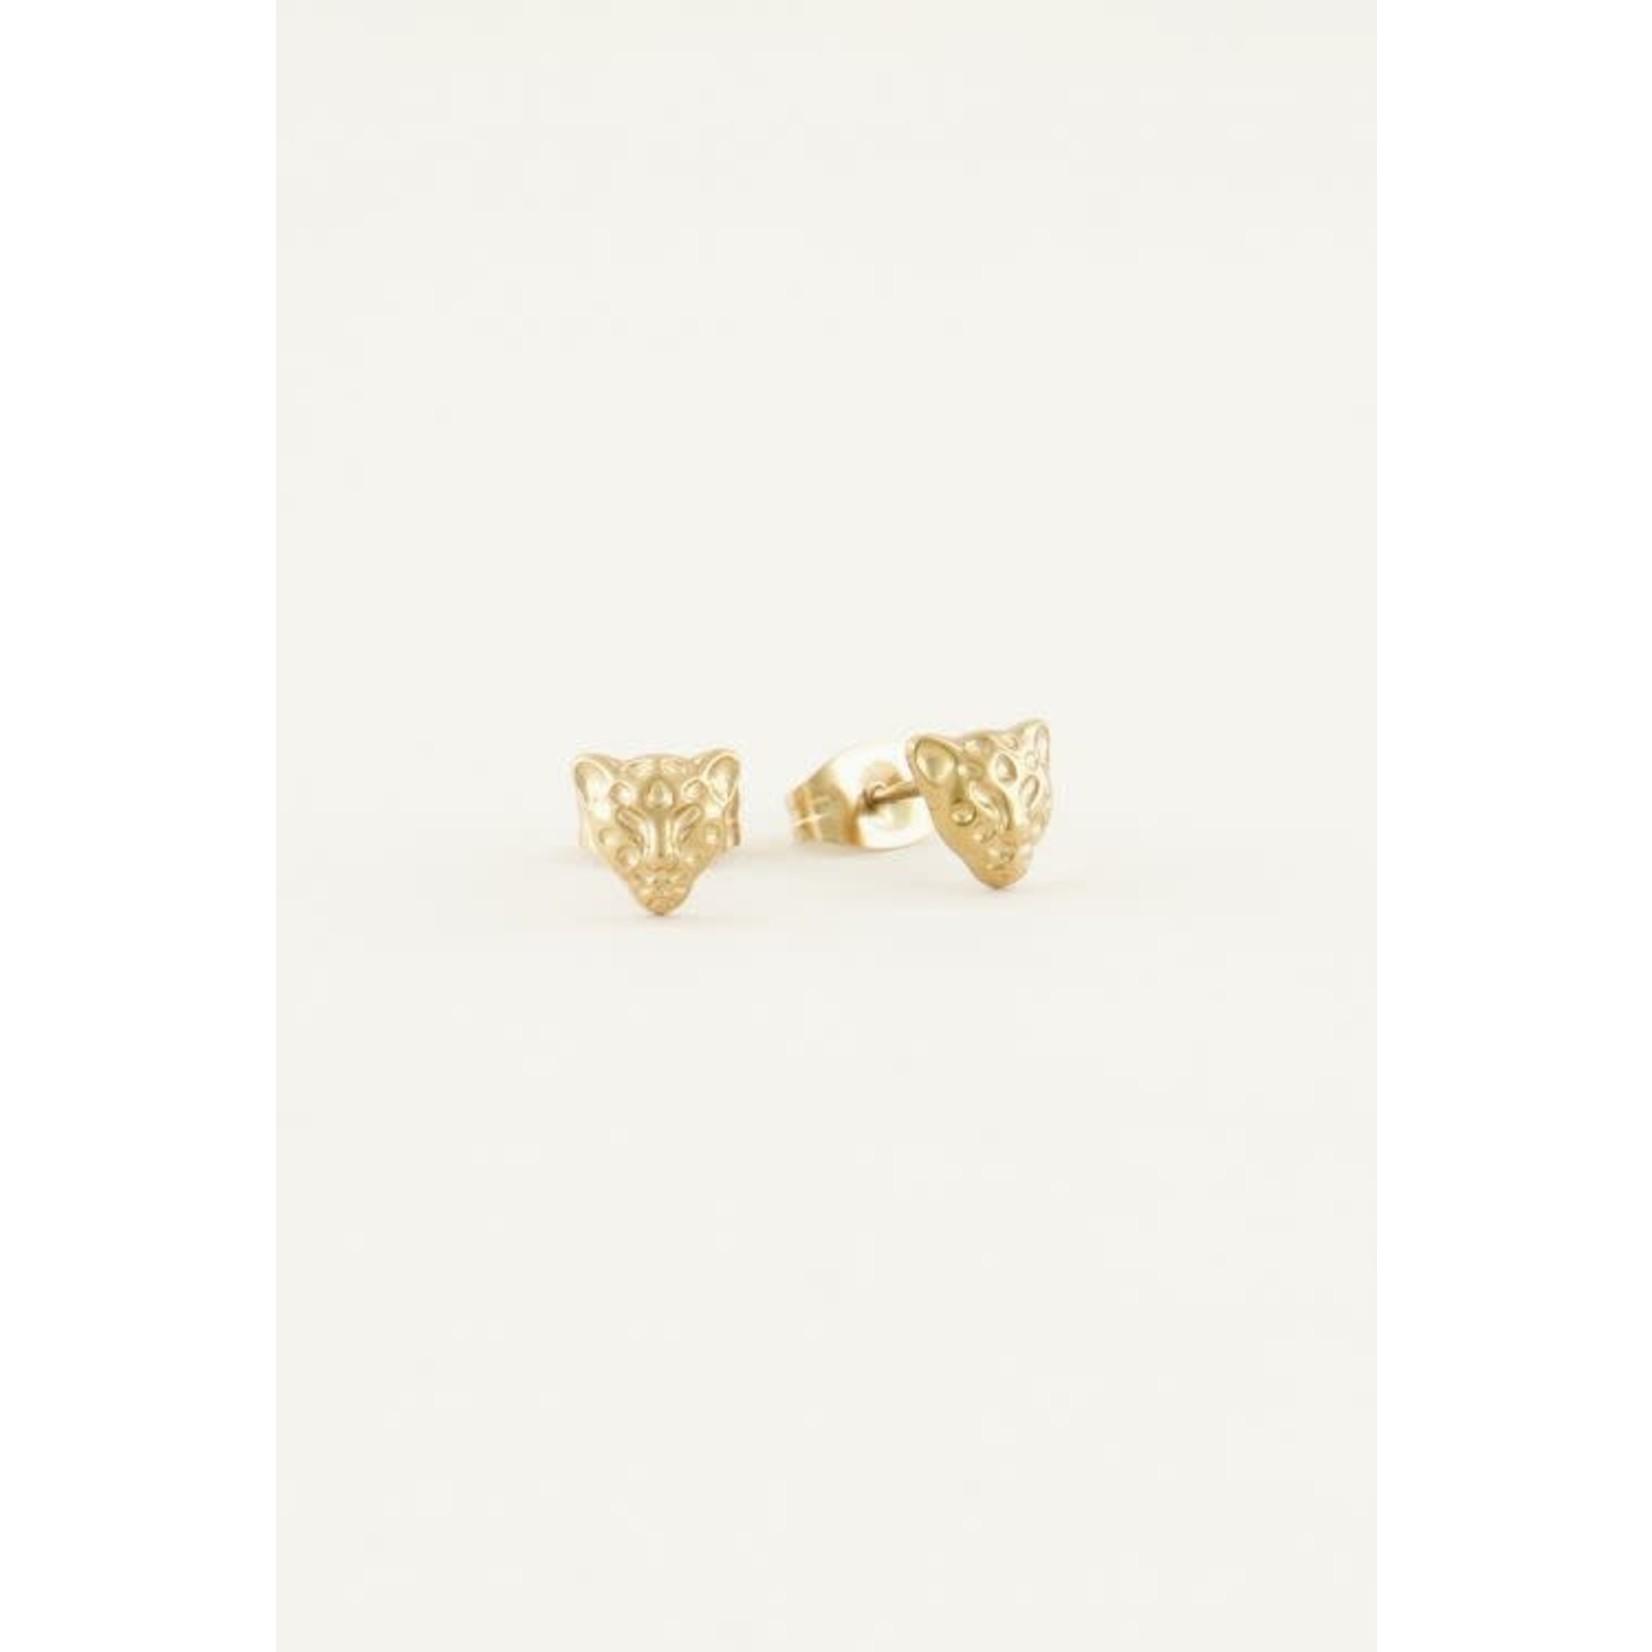 My Jewellery My Jewellery Studs Luipaard Goud